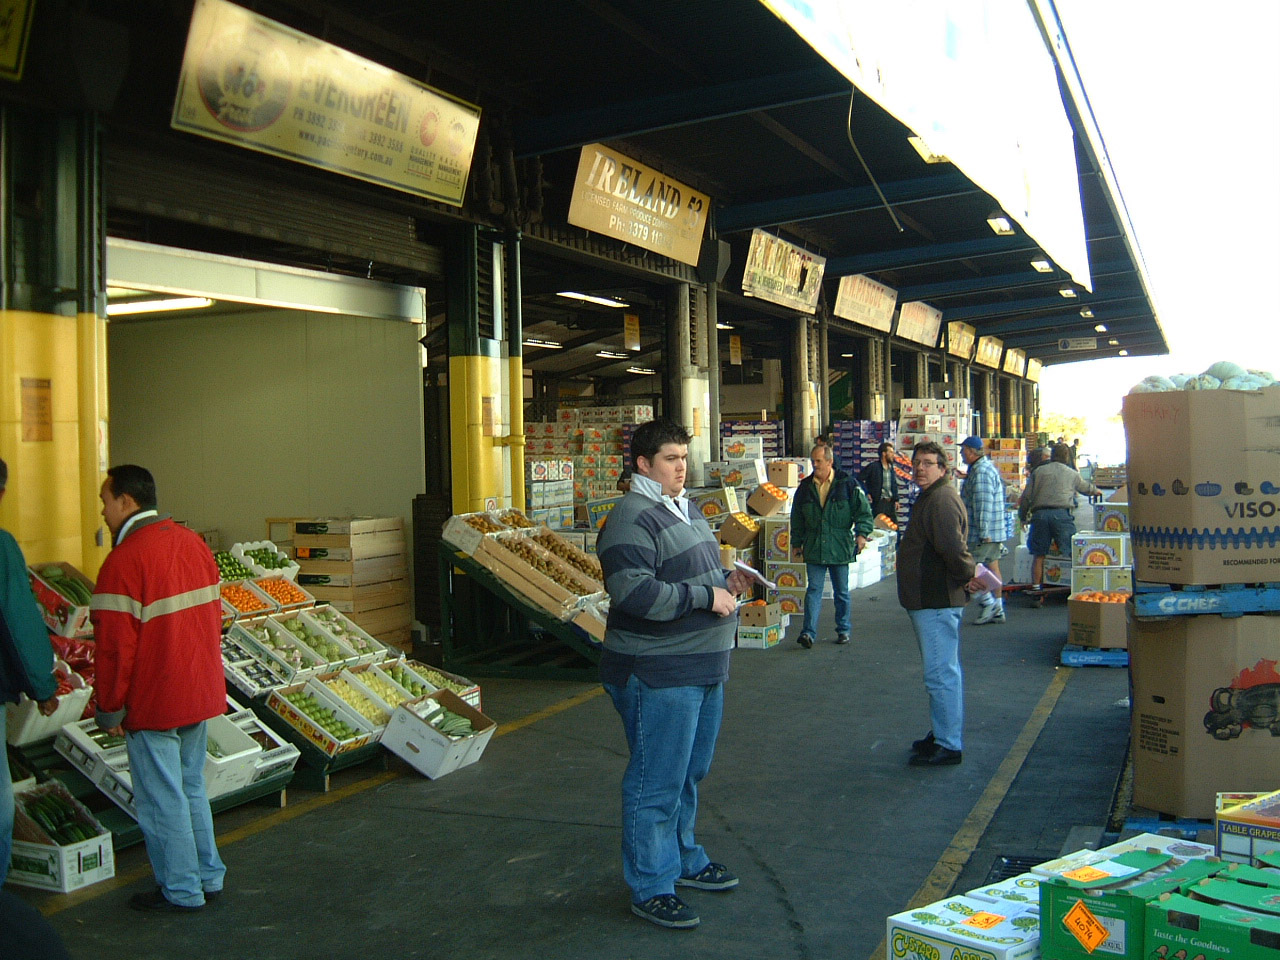 Brisbane Markets Sherwood Road Rocklea Queensland 4106 Jun 2002 I02